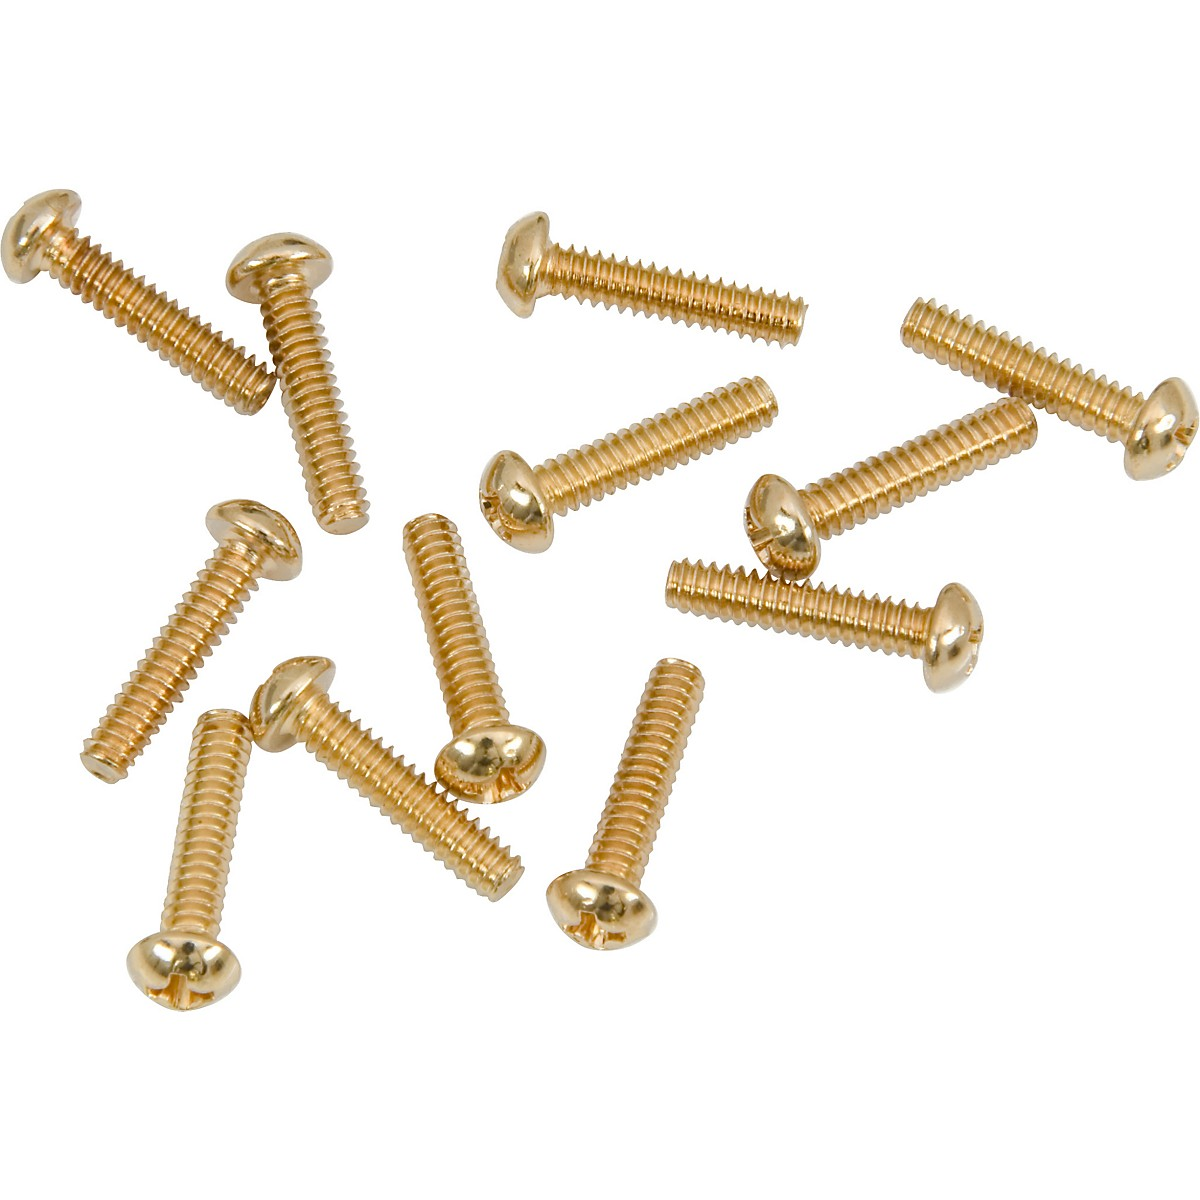 Fender Gold Pickup/Switch Screws (12)